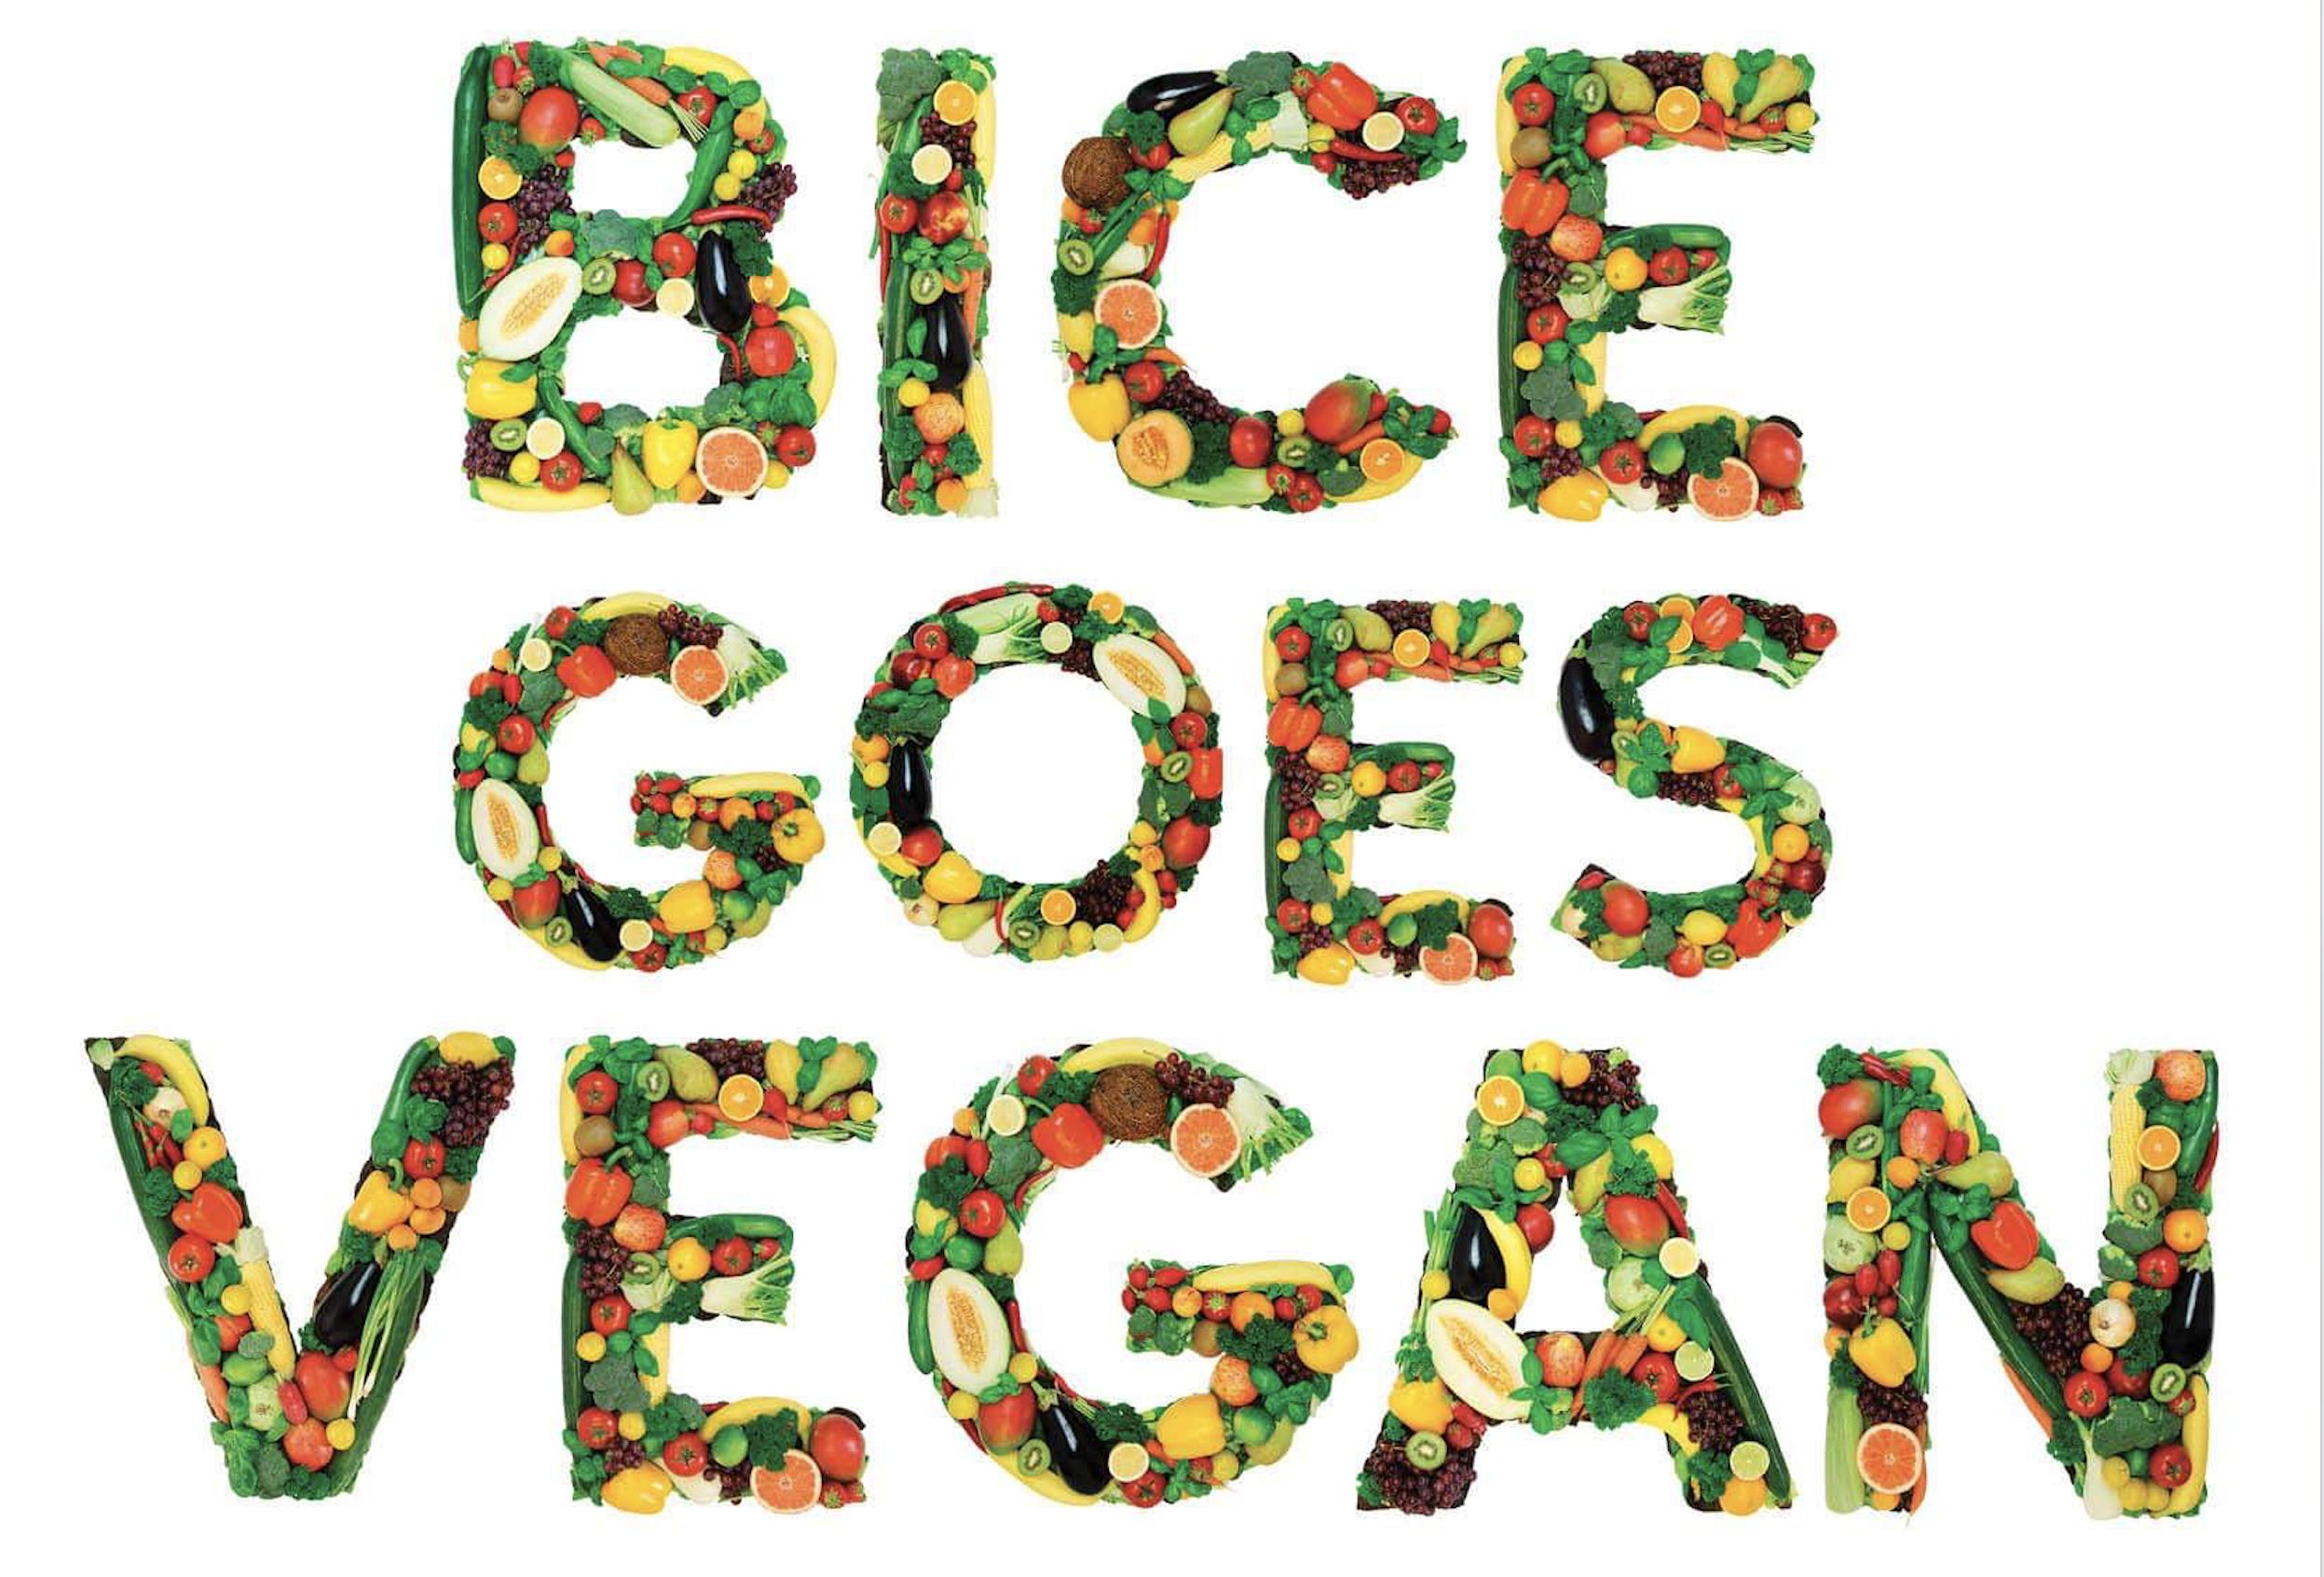 paolo gramaglia vegan dinners dubai